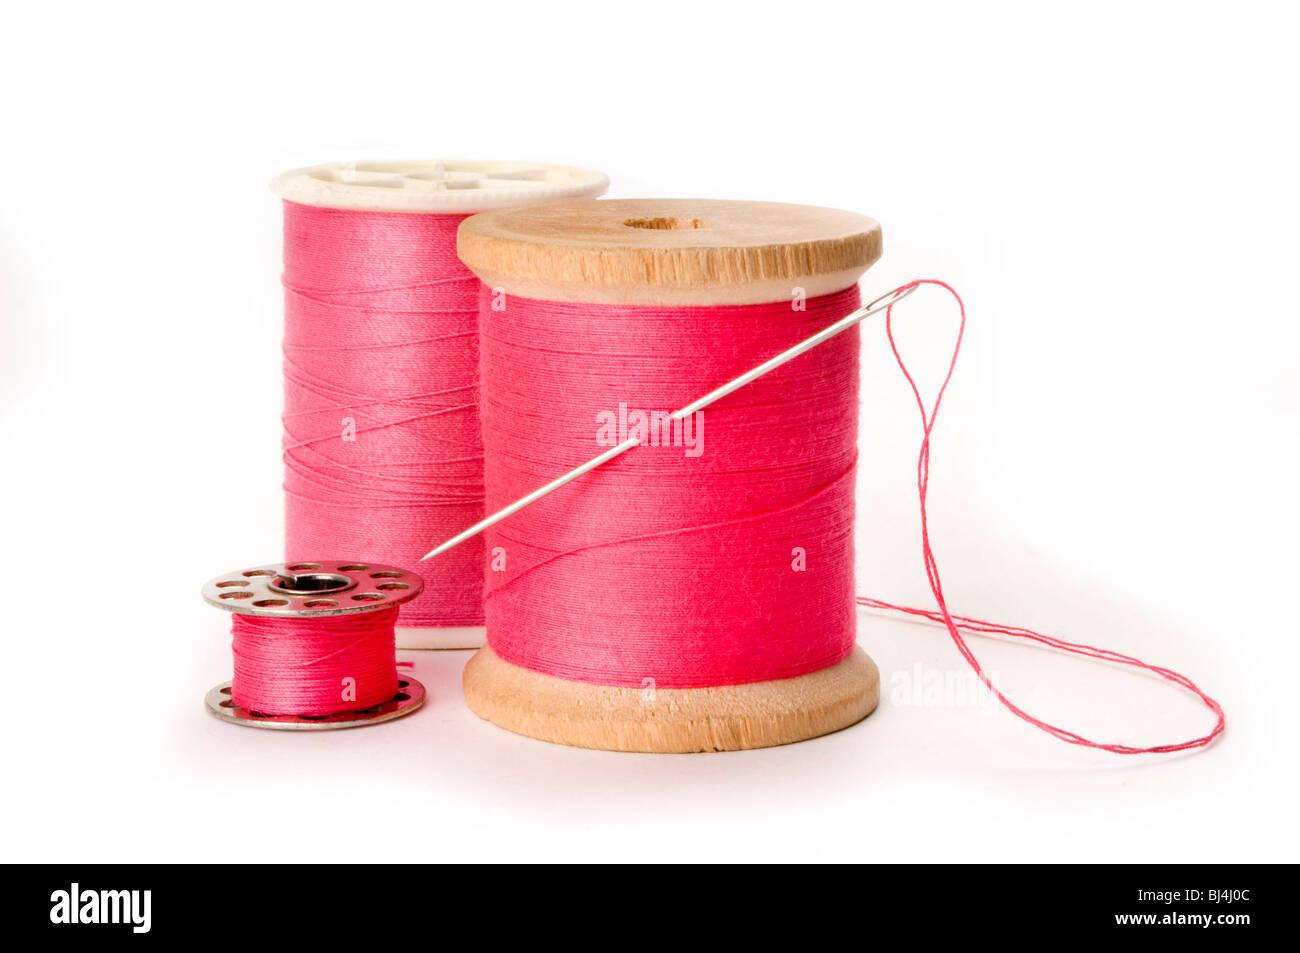 needle and thread - Stock Image